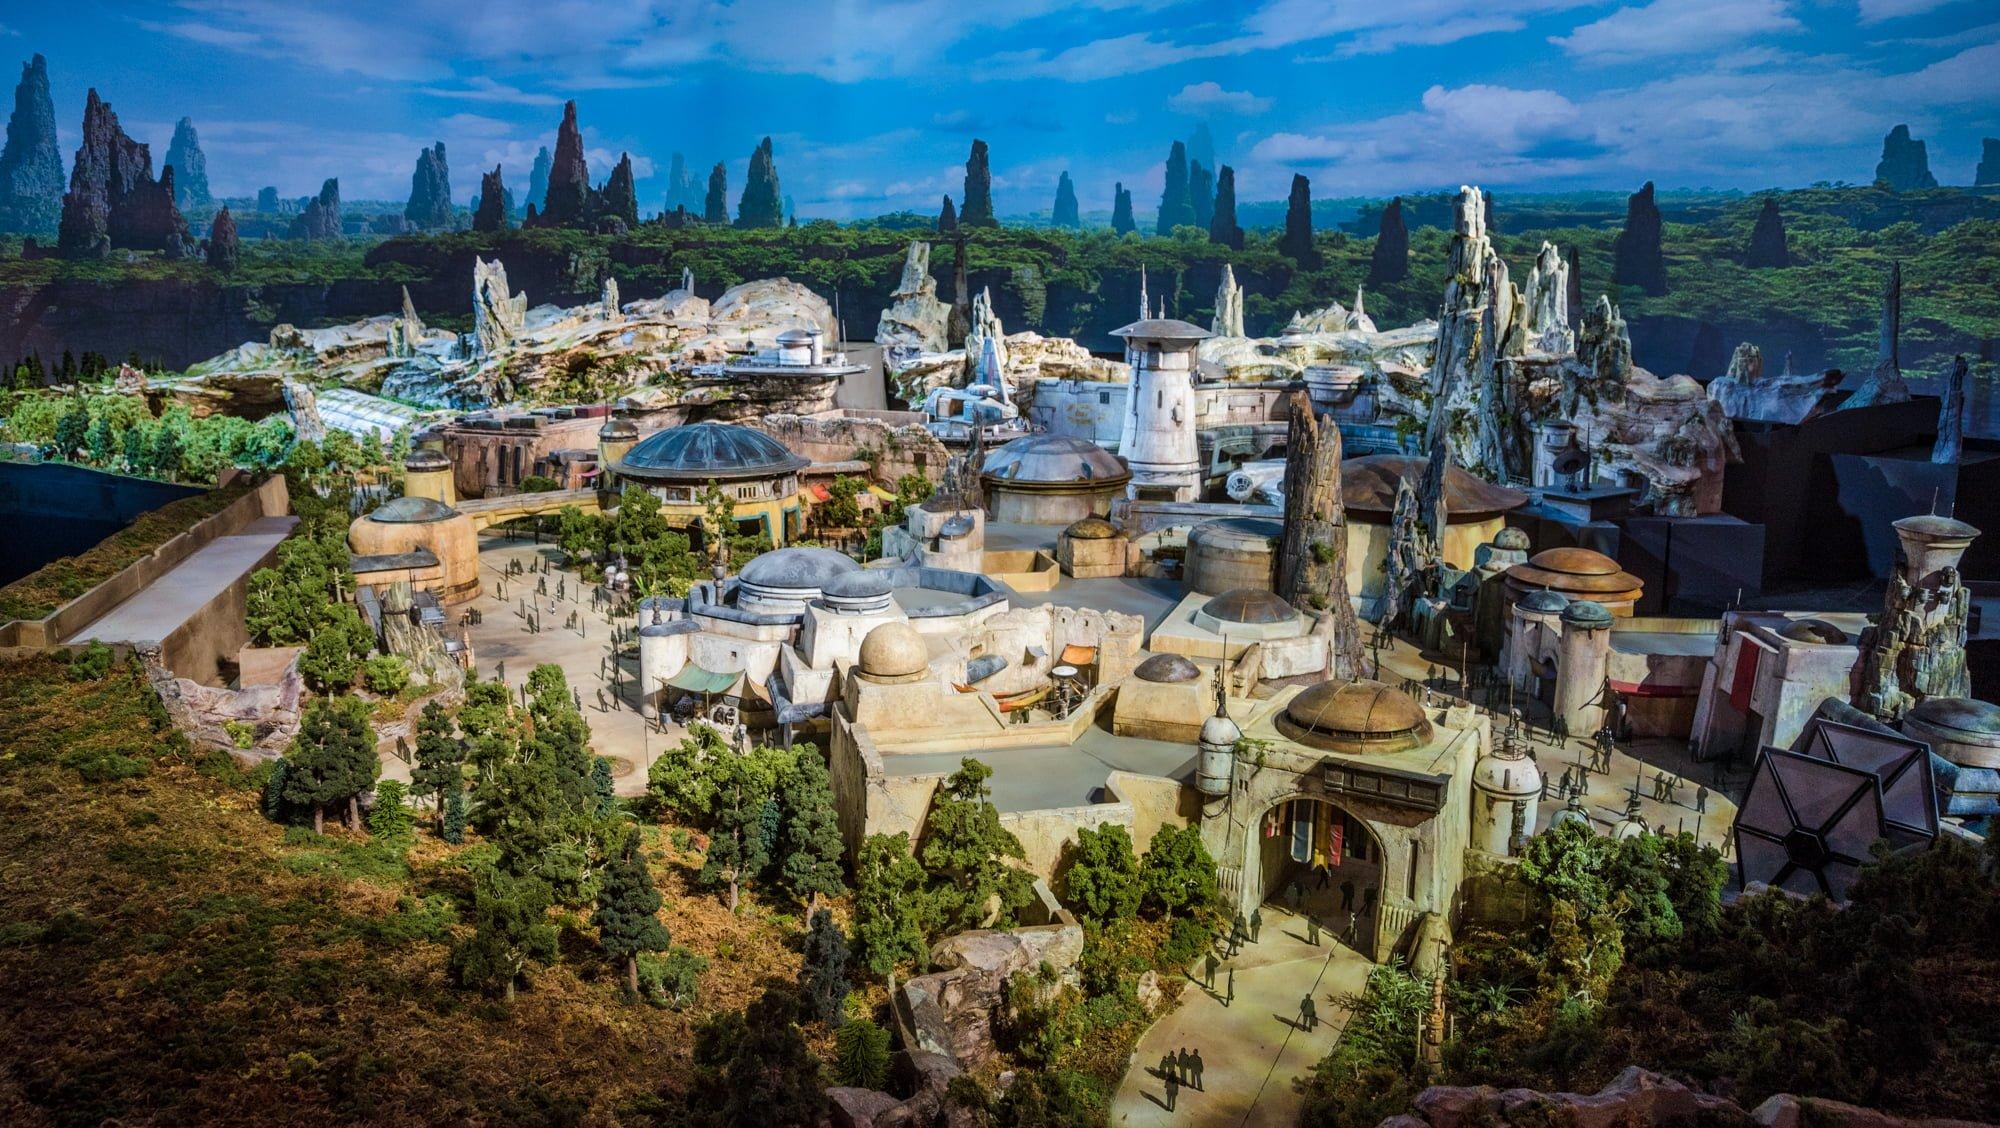 Should You Visit Disney World in 2018...or Wait for 2019, 2020 ...